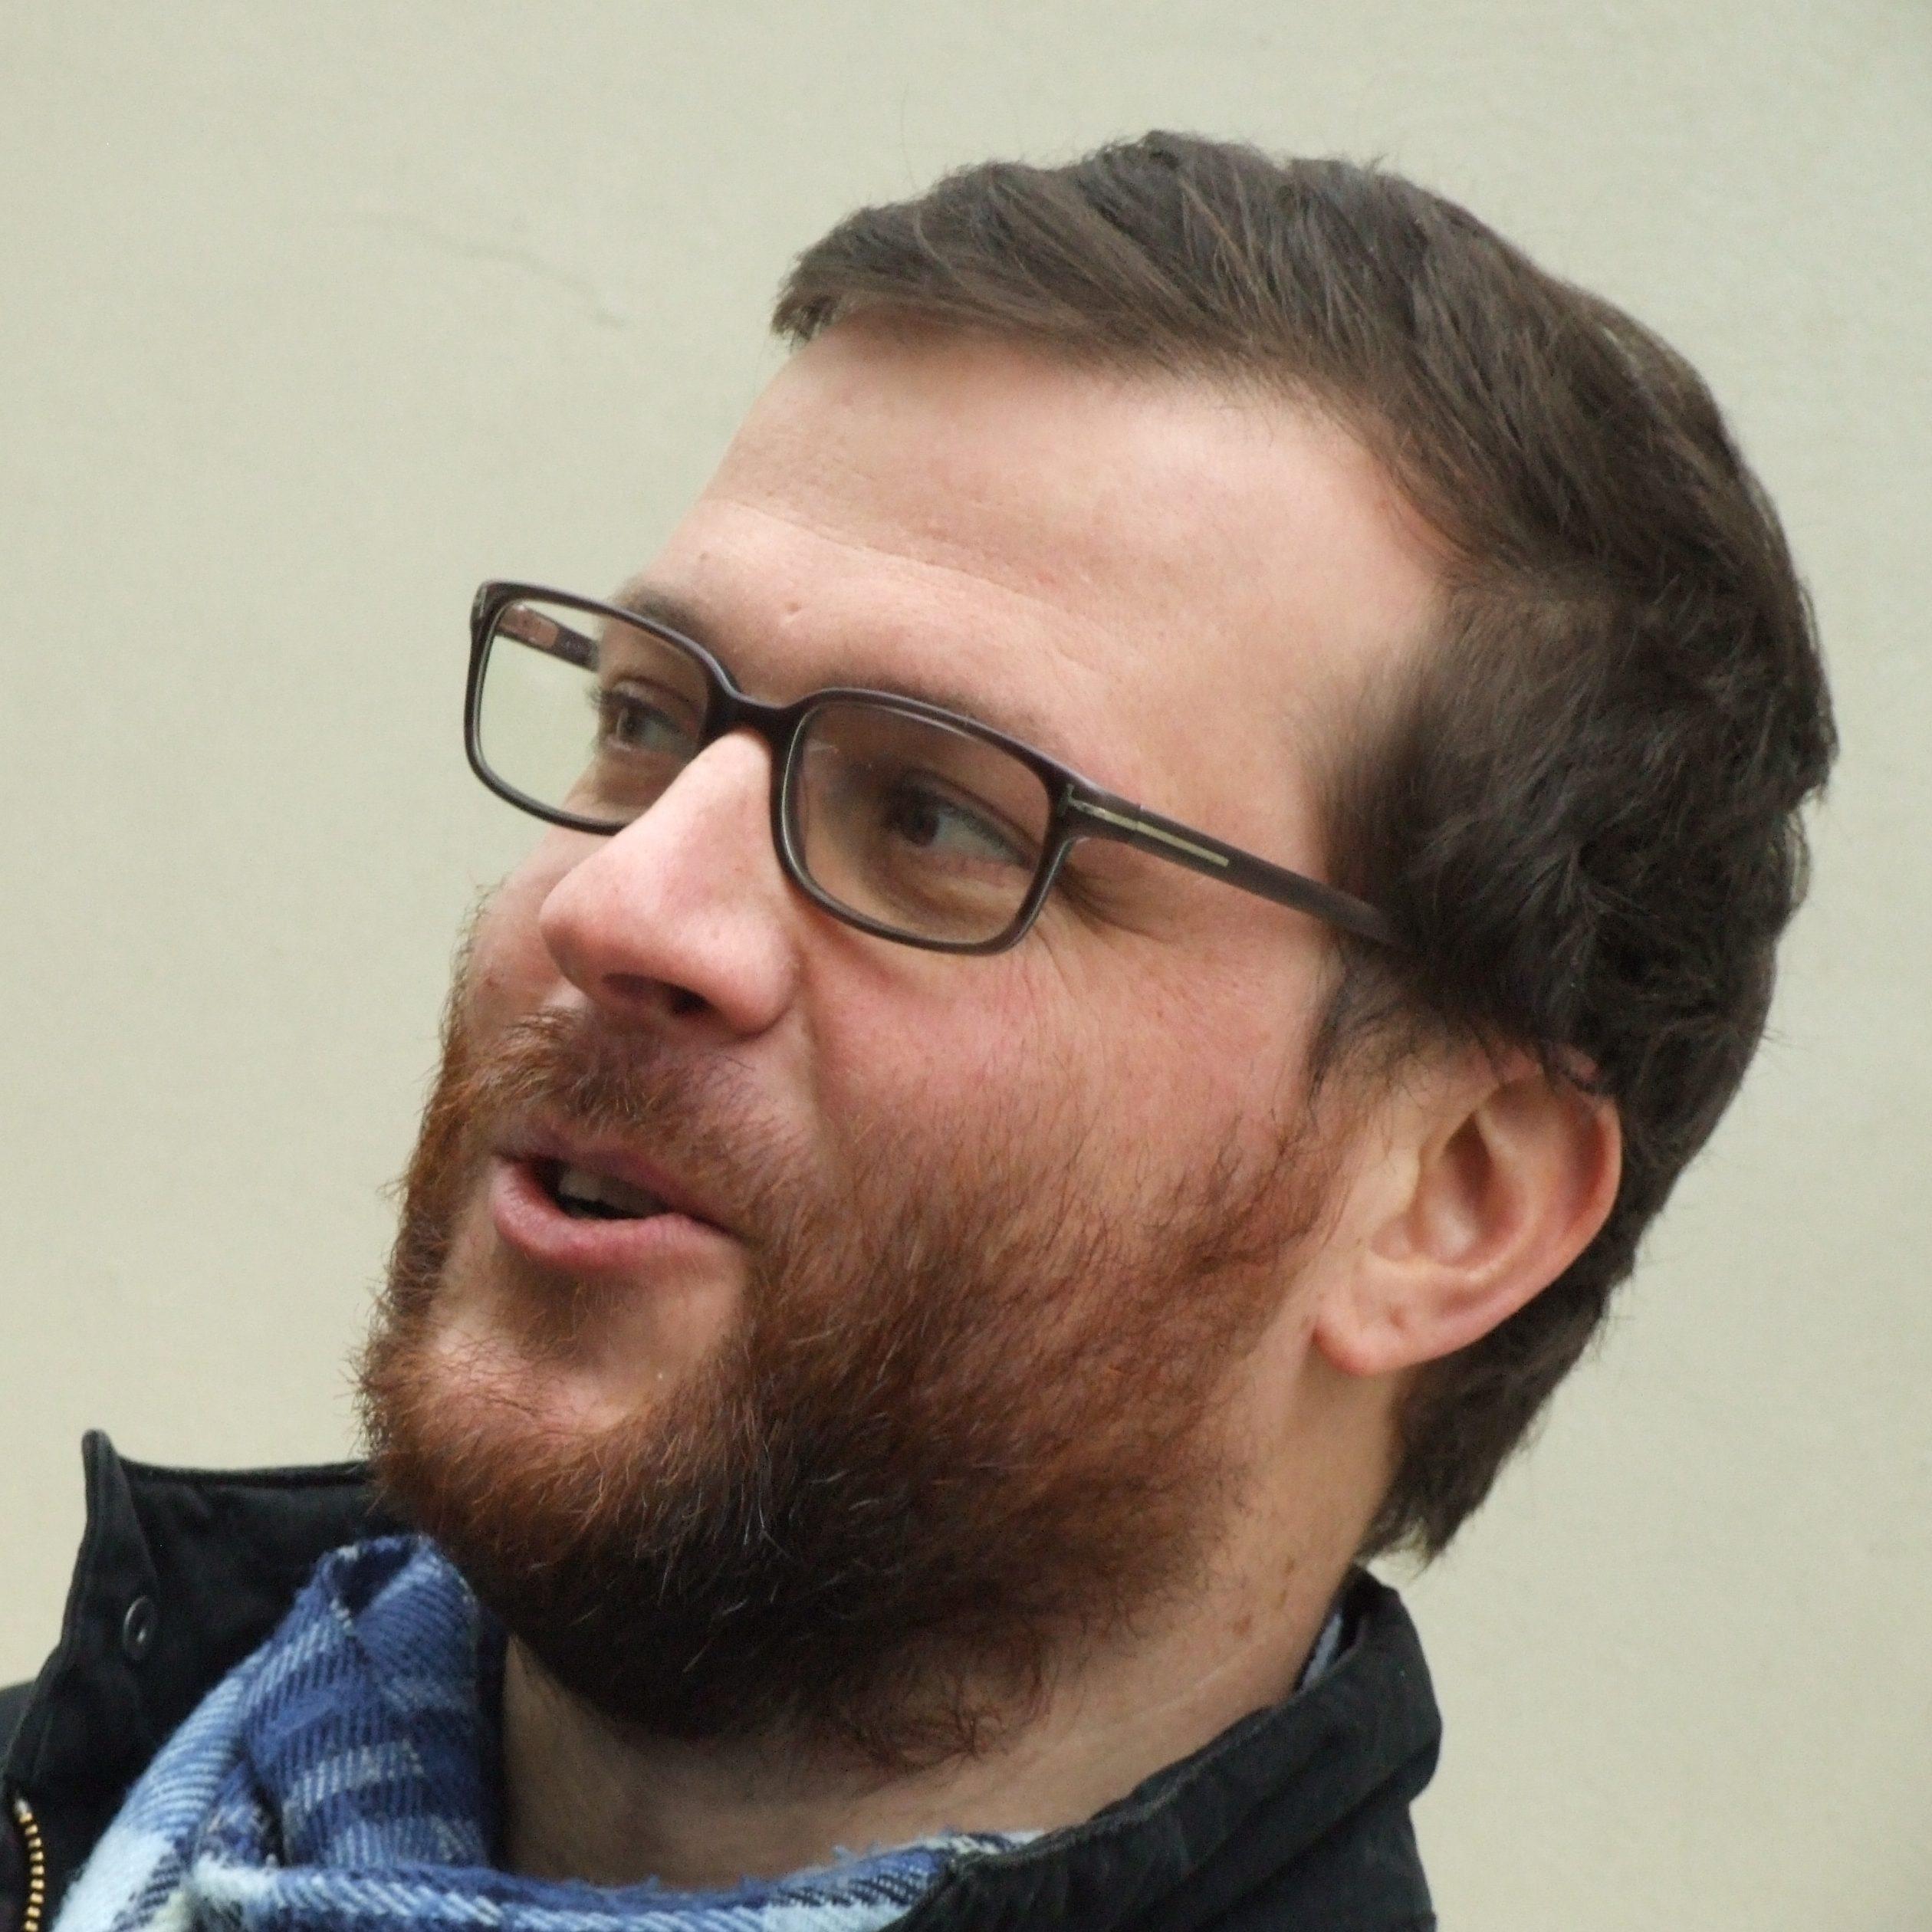 Francis Vaningelgem, Urban Planner - Researcher, Childhood & Society Research Centre, Belgium